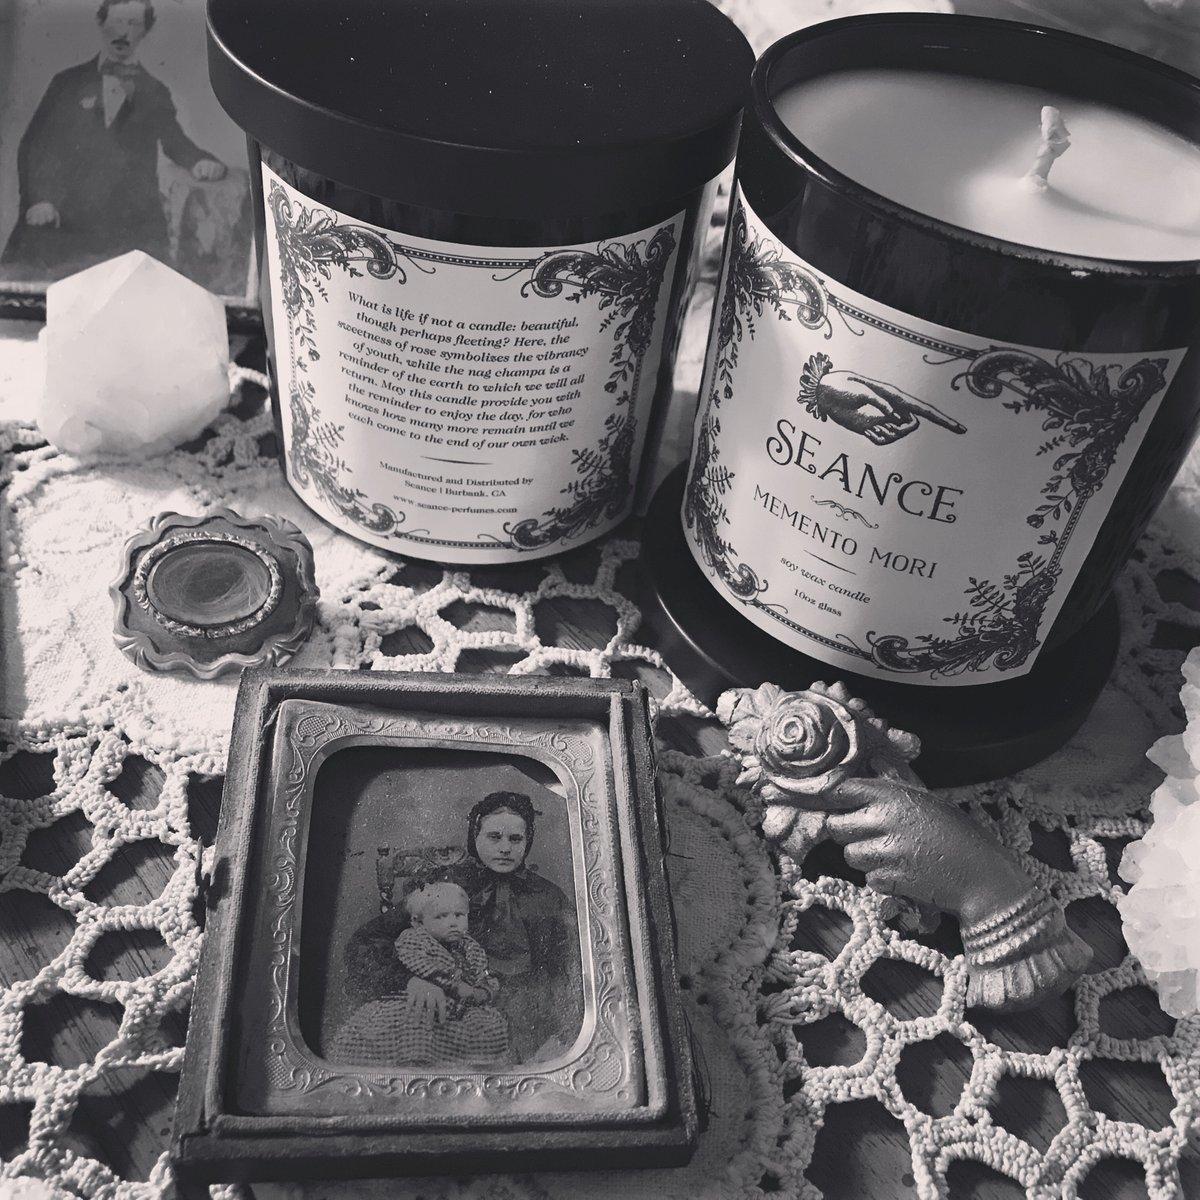 memento-mori-candle.jpg